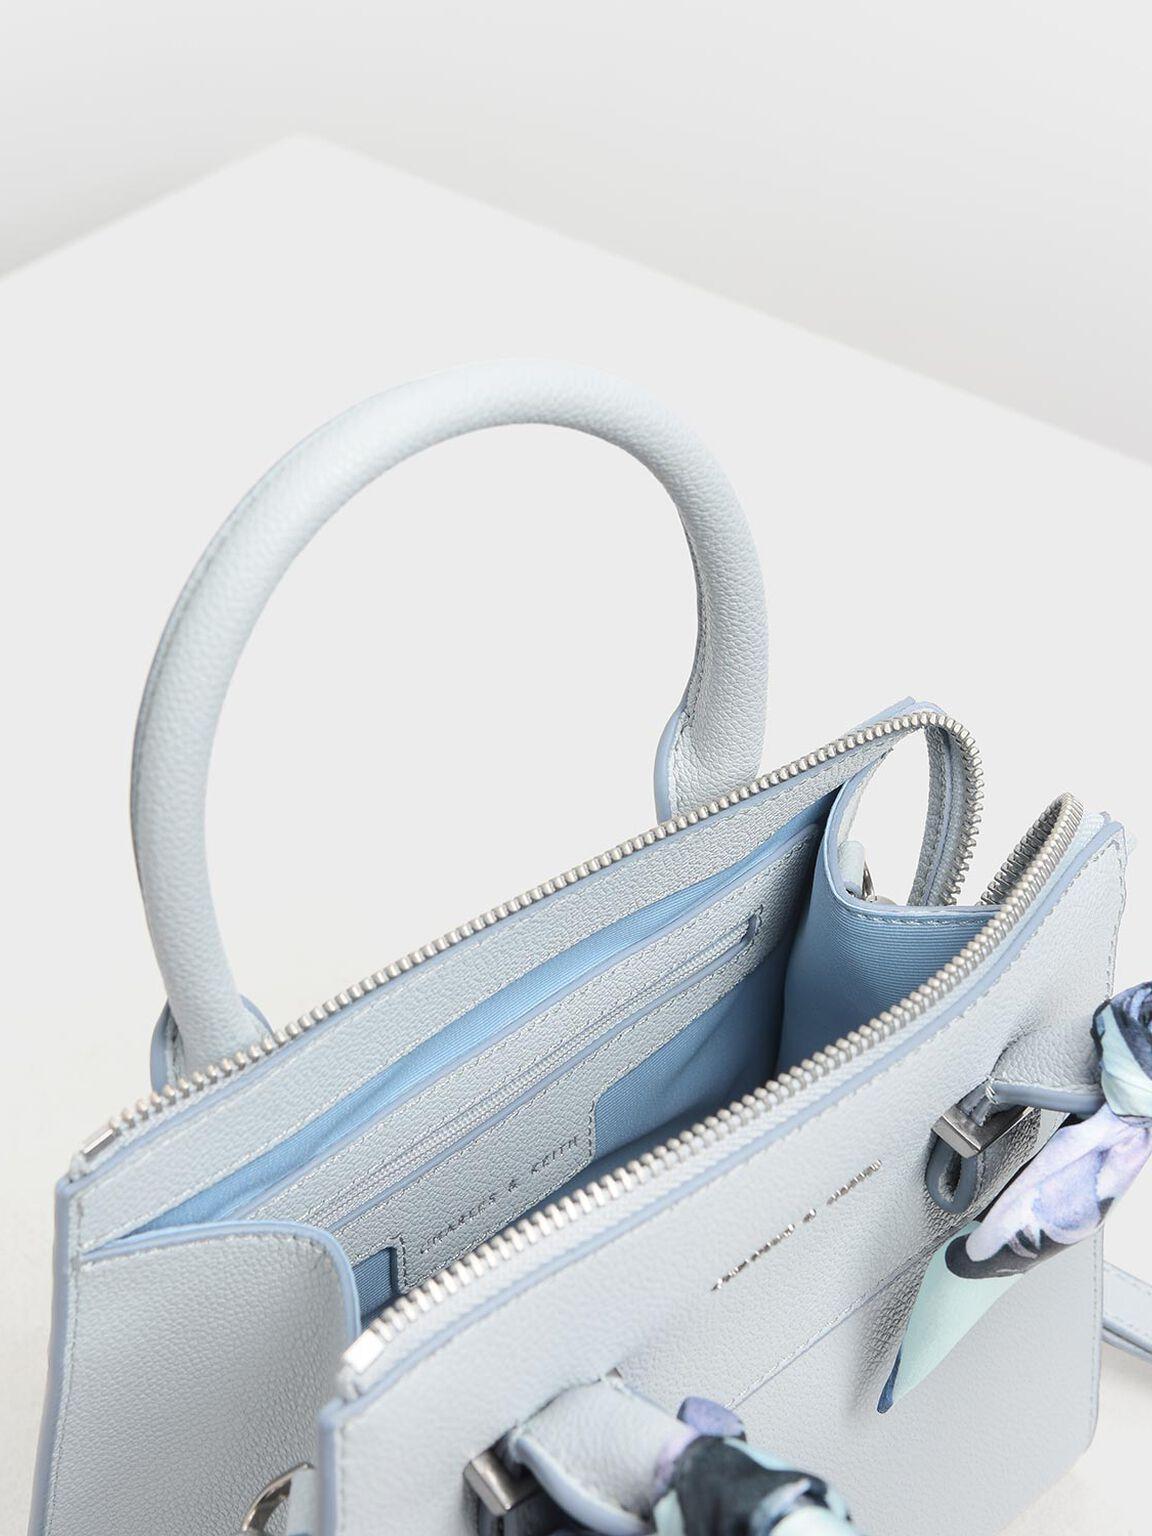 Scarf Wrapped Top Handle Bag, Light Blue, hi-res